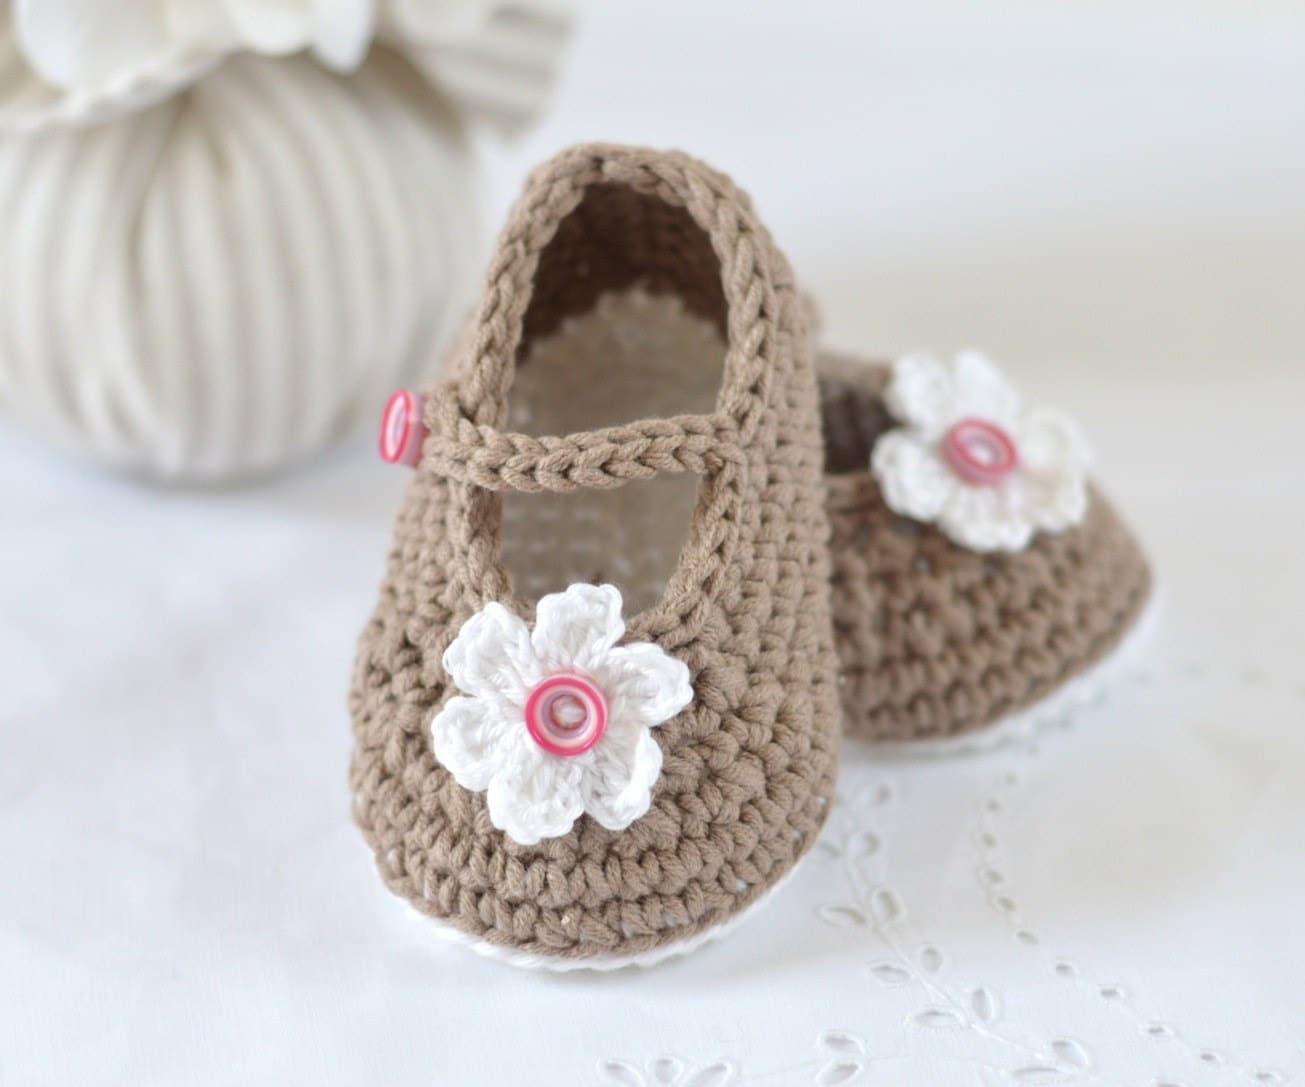 Crochet Pattern Baby Shoes Mary Janes Photo Tutorial Crochet Etsy